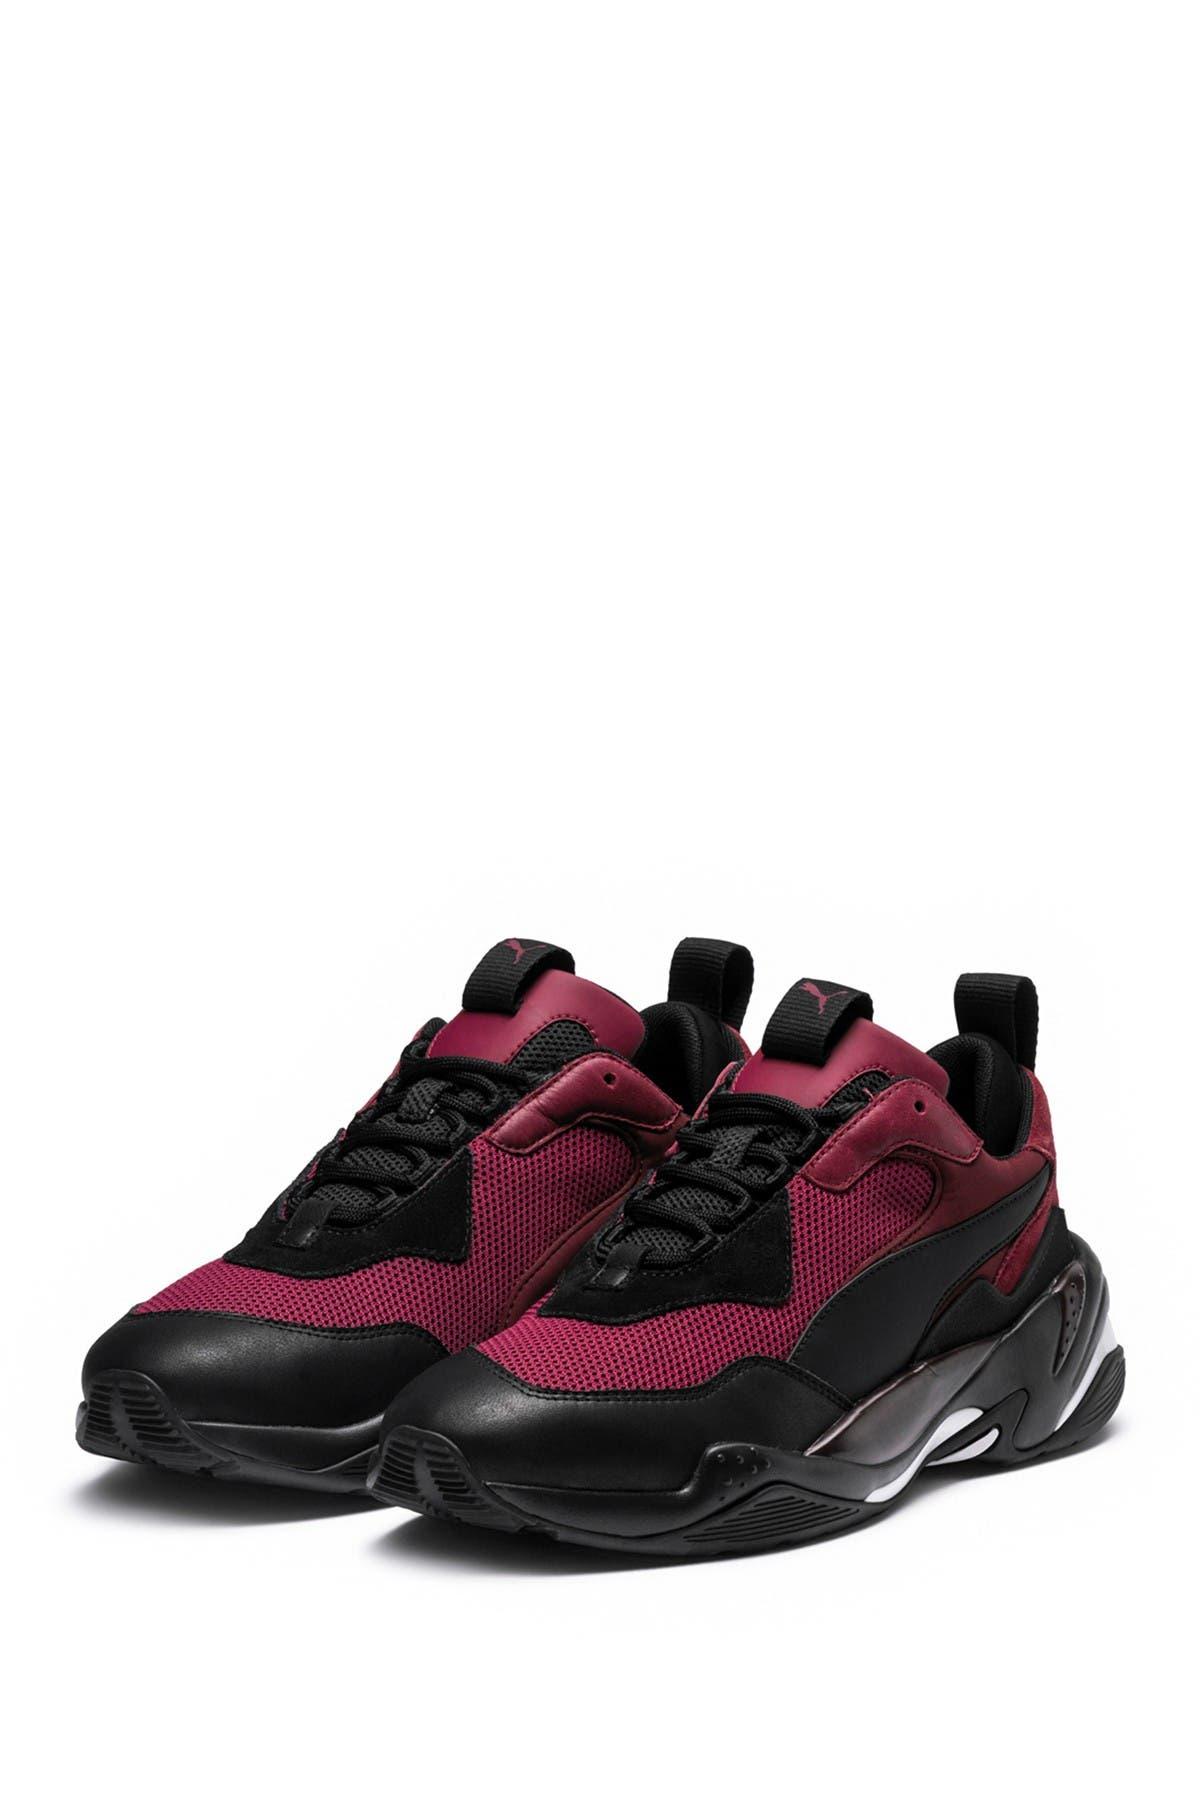 PUMA | Thunder Spectra Sneaker